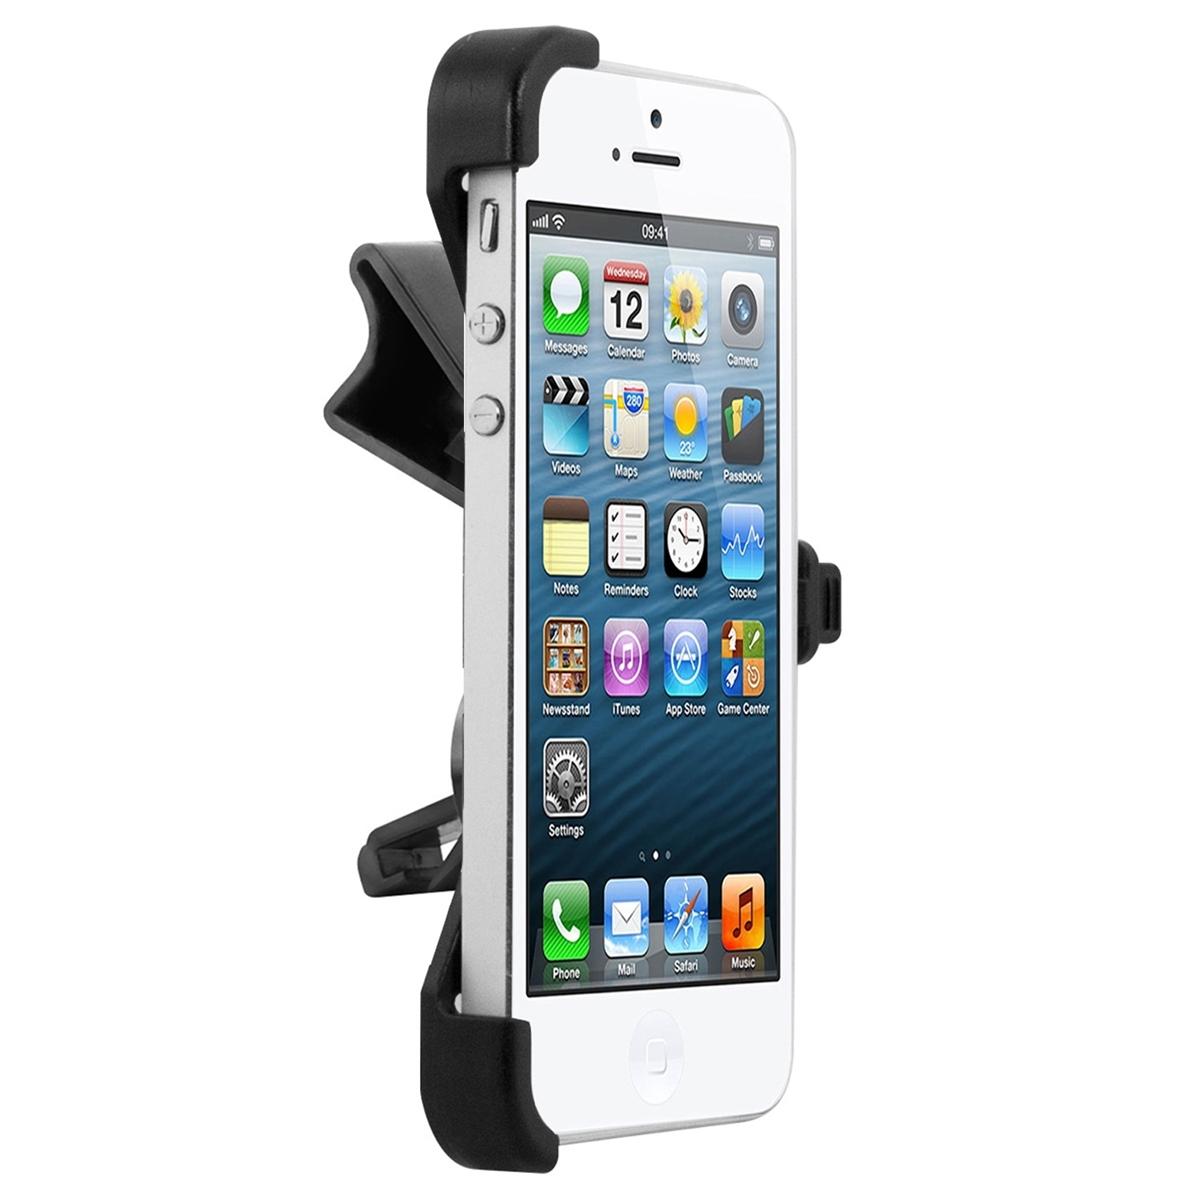 kwmobile mont de grille pour apple iphone se 5 5s chargeur support voiture ebay. Black Bedroom Furniture Sets. Home Design Ideas